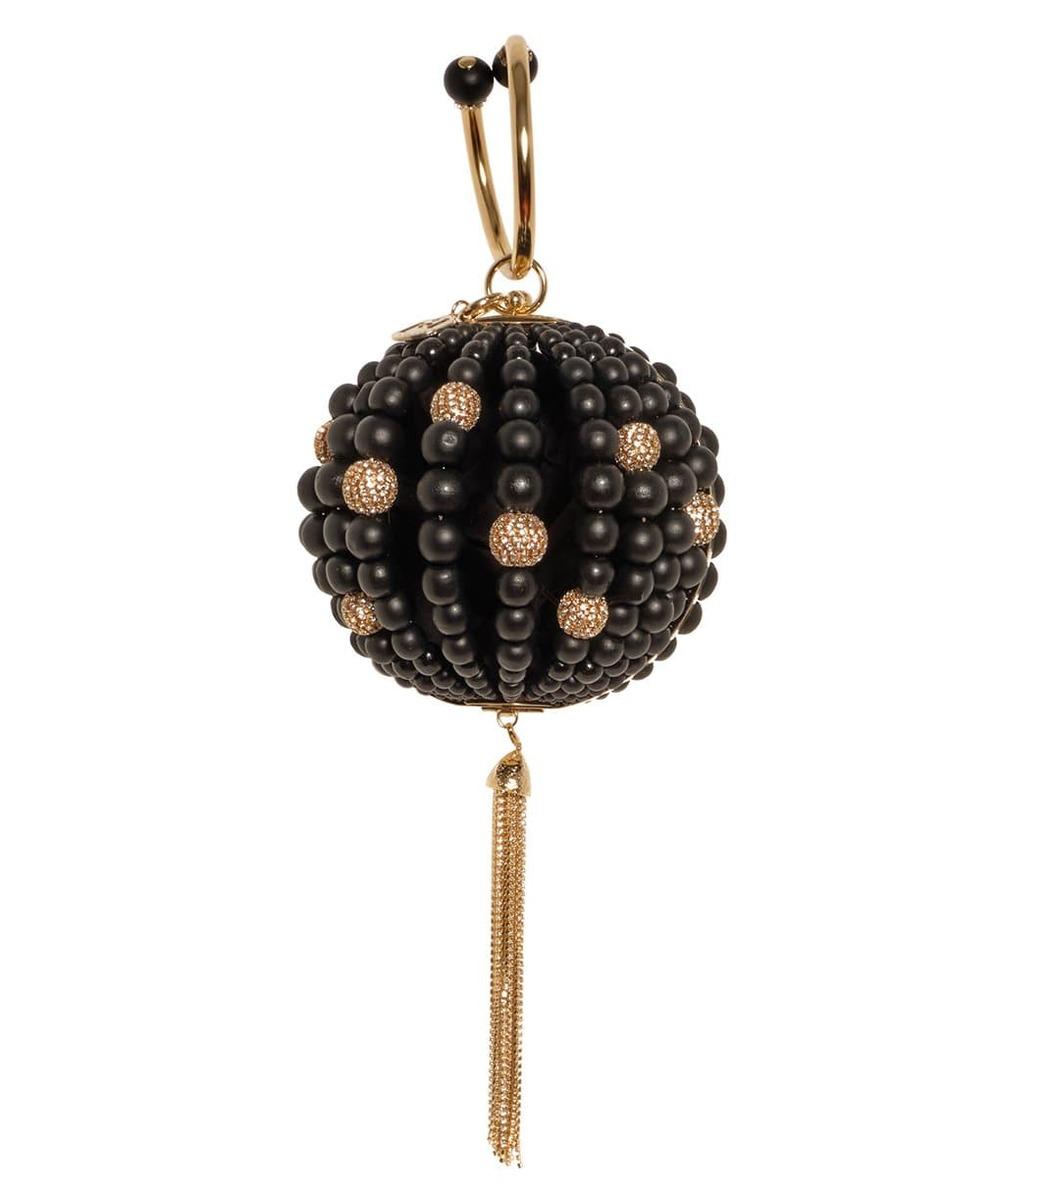 Rosantica Marachella Round Bead Bag - Black